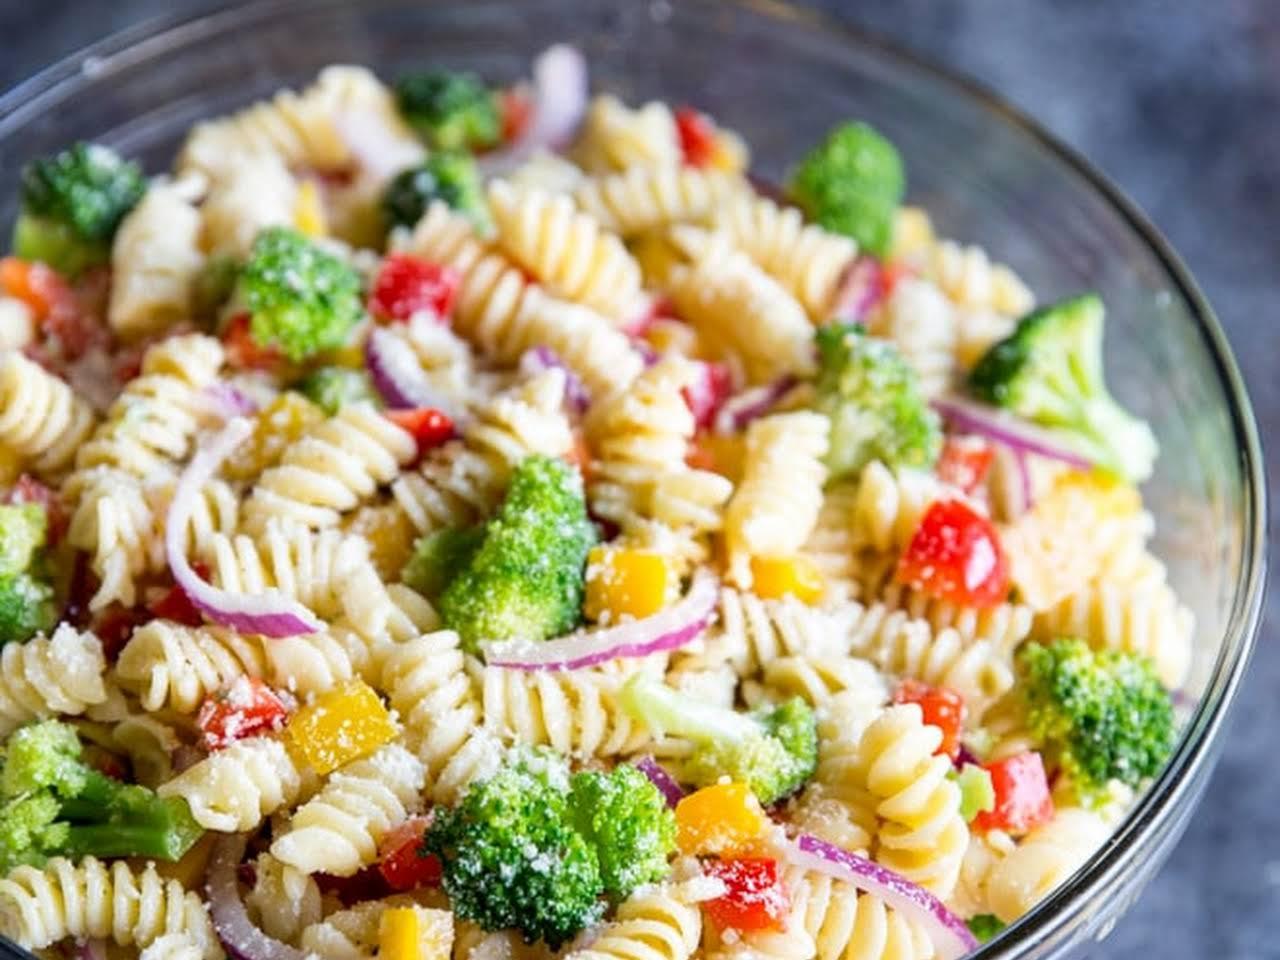 Pasta Salad Recipe With Mayo